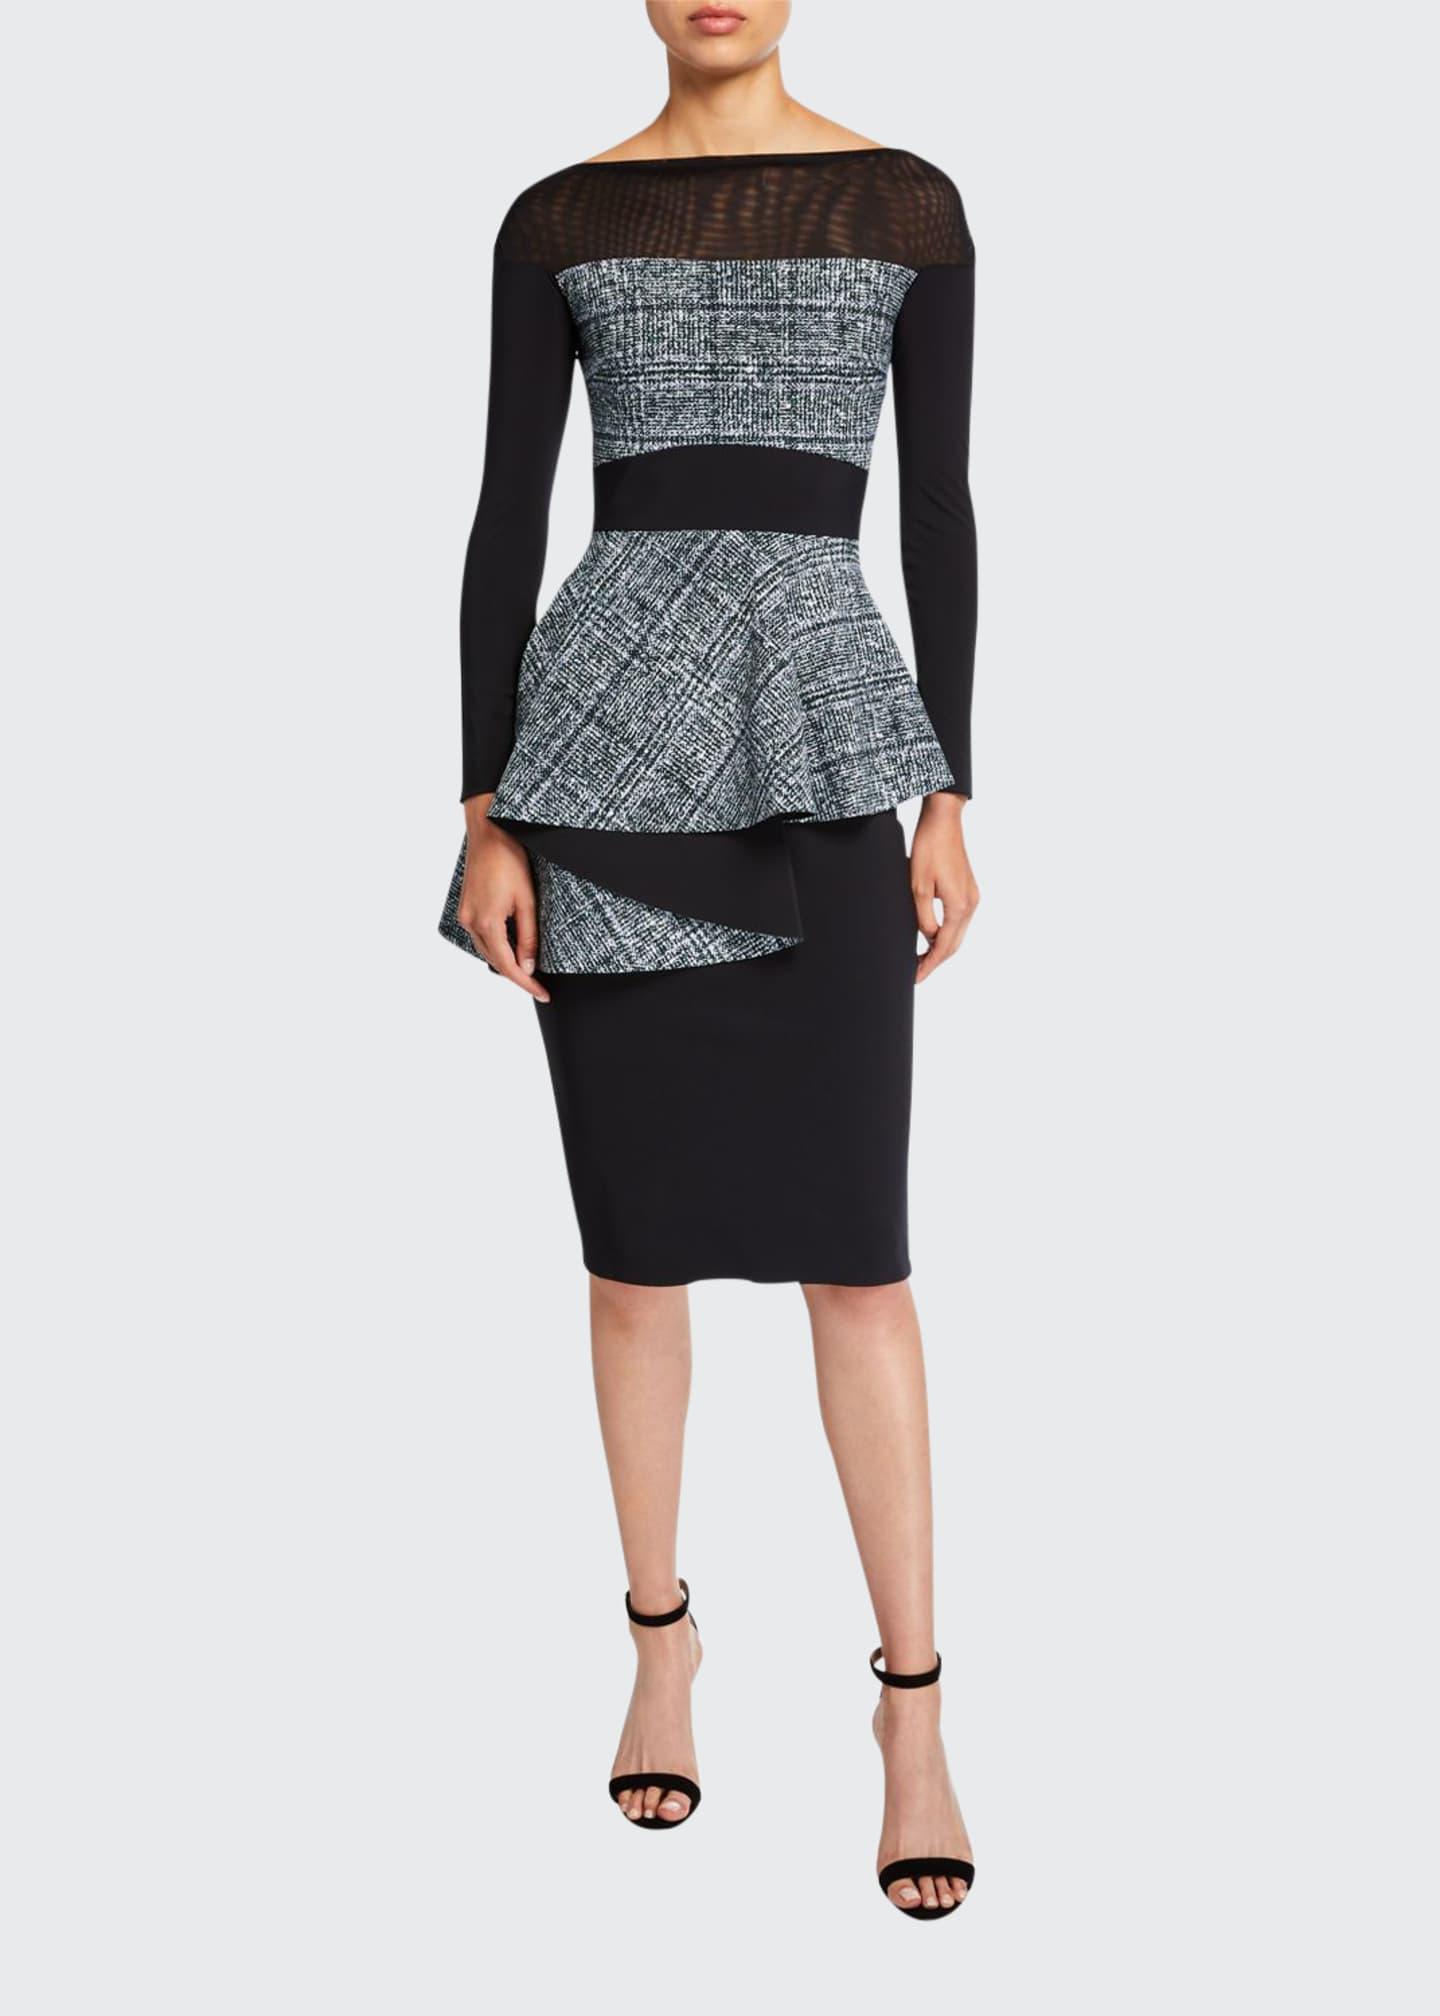 Chiara Boni La Petite Robe Bateau-Neck Long-Sleeve Tweed